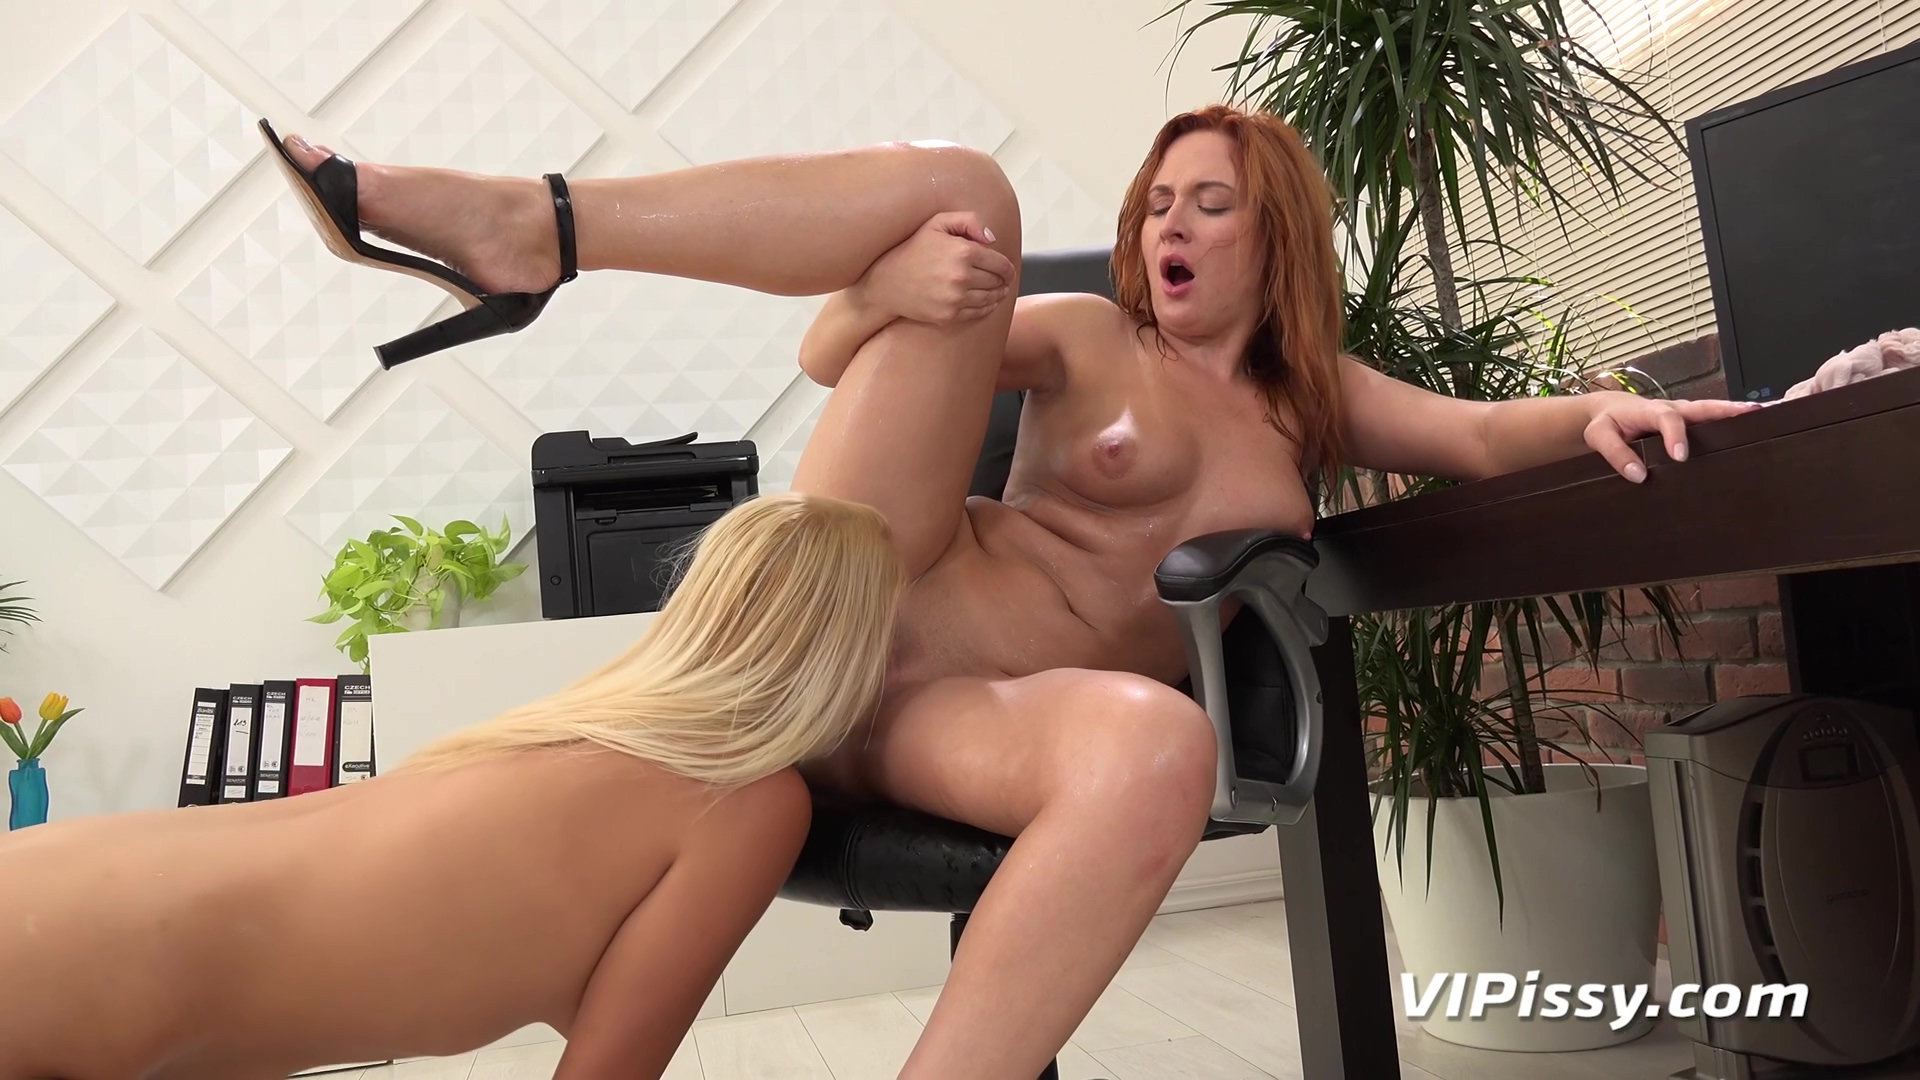 Video 1476066804: pissing lesbians, lesbian cunnilingus, lesbians big tits toys, big tits blonde lesbian, big tits lesbian hd, red head lesbian, fucking cleaning lady, fucking straight